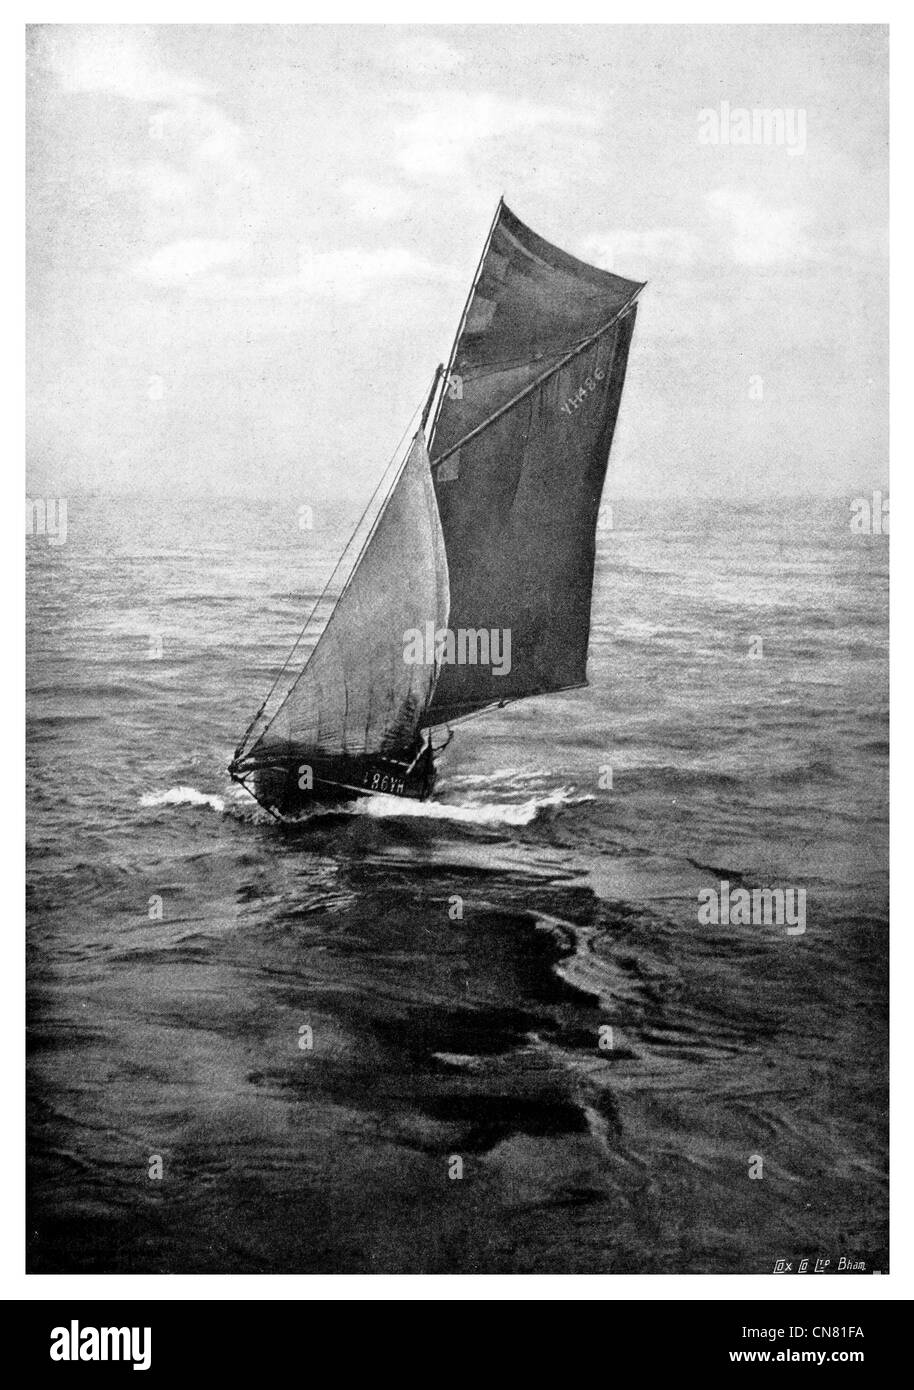 sailing sail Edwardian era 1900 - Stock Image